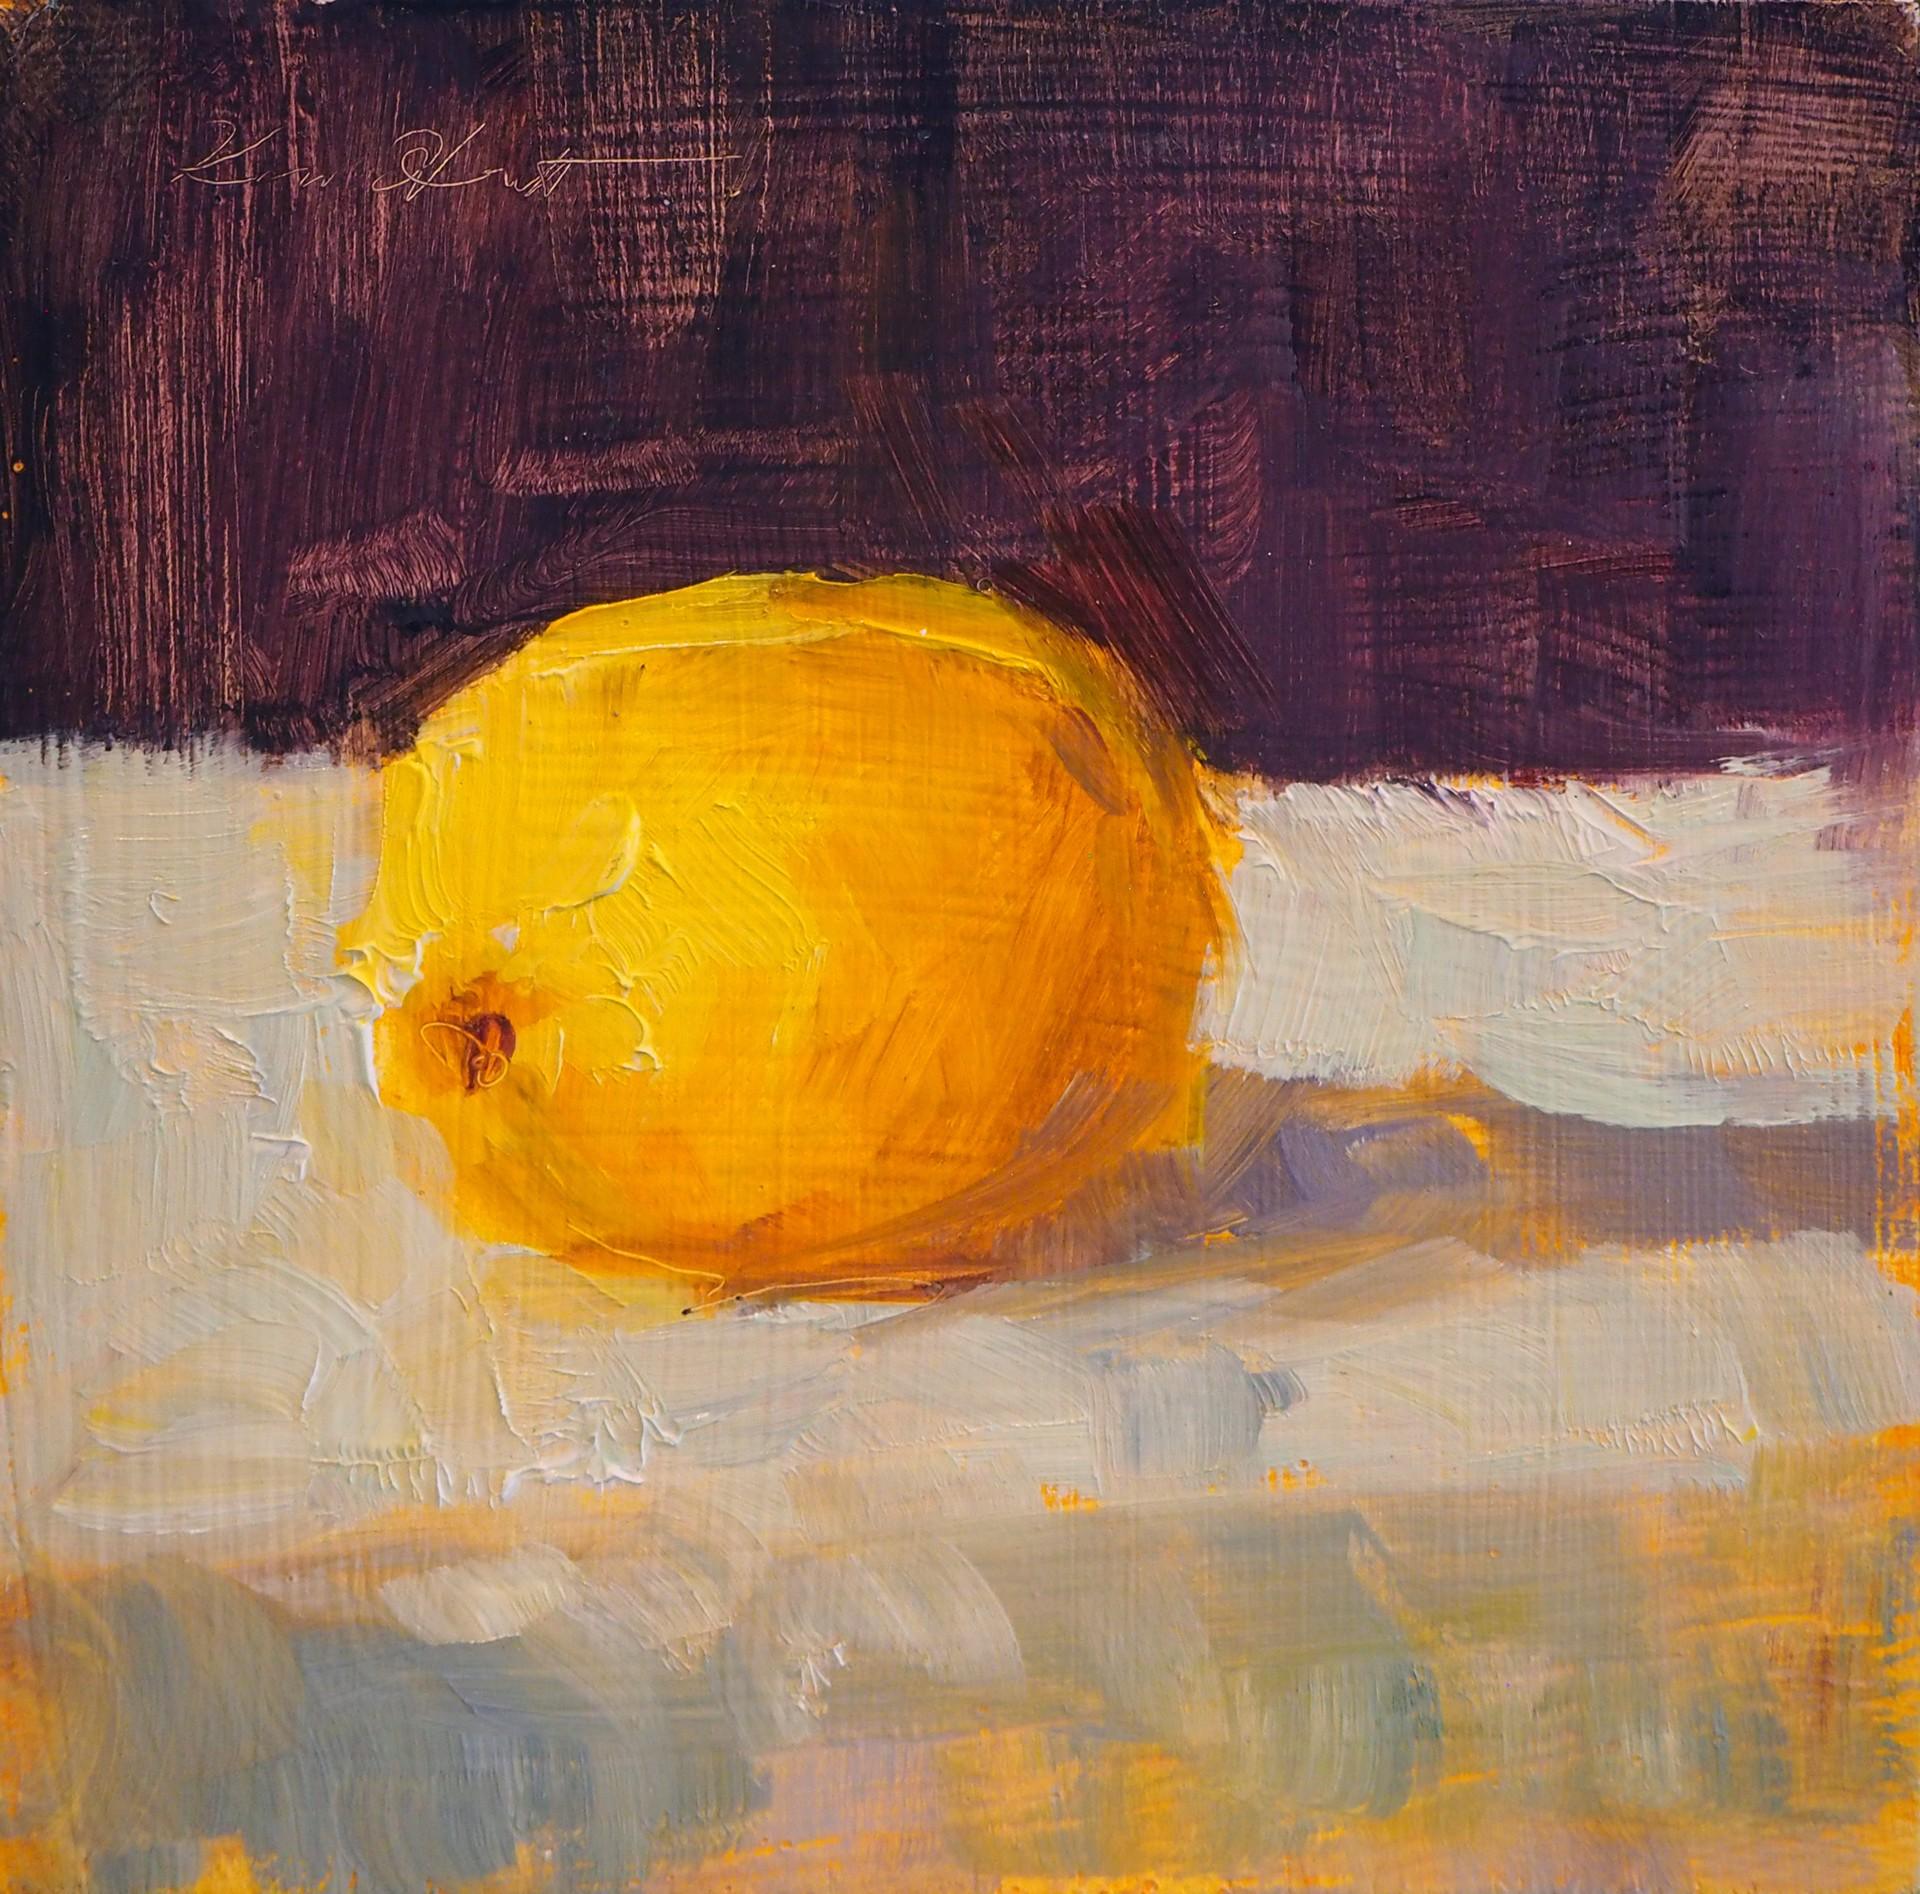 Compliments for the Lemon by Karen Hewitt Hagan